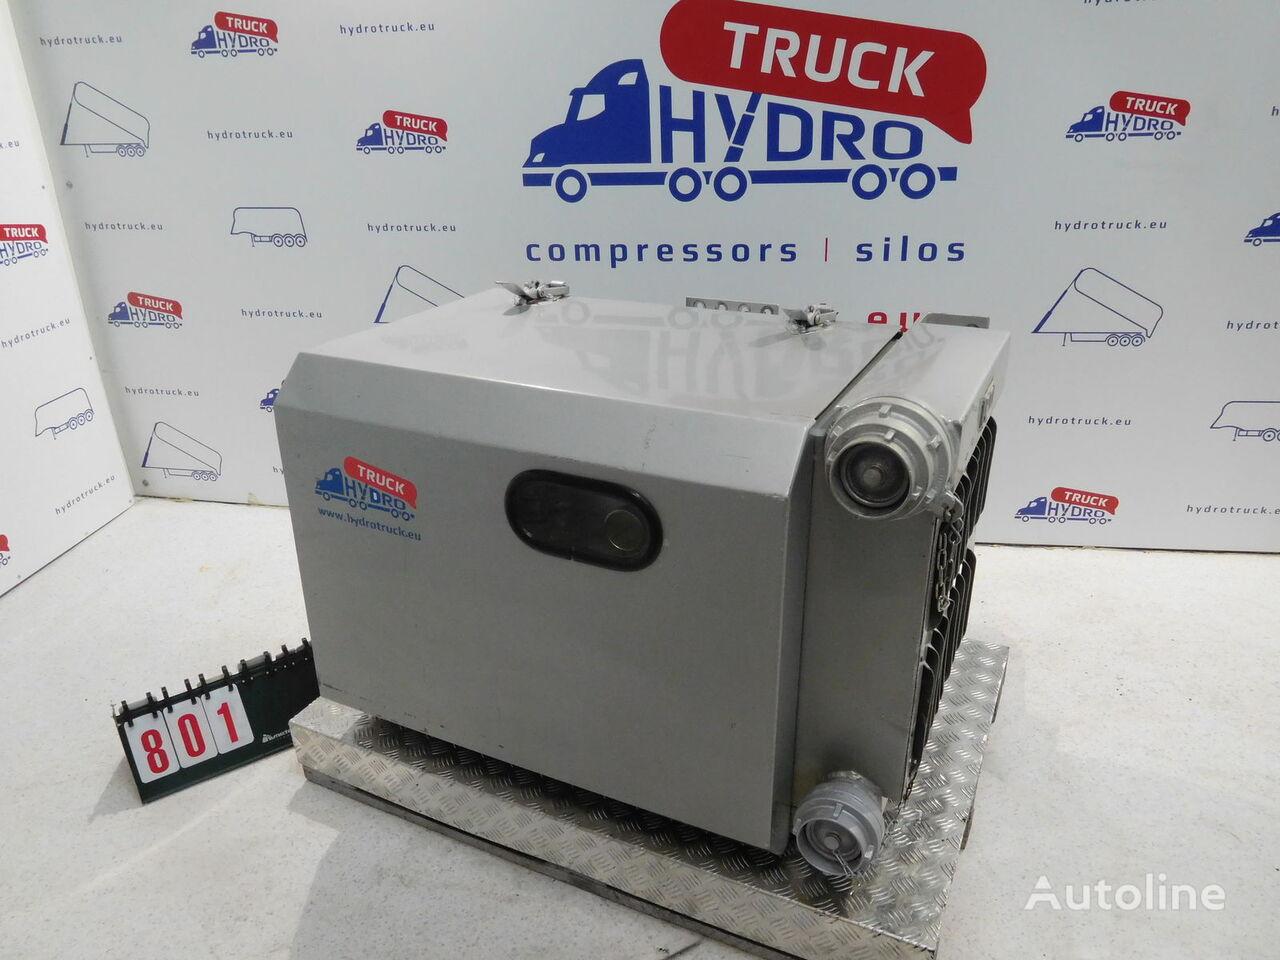 TYPHON 2C MOUVEX BLACKMER W ZABUDOWIE RTI compressor pneumático para cisterna semi-reboque